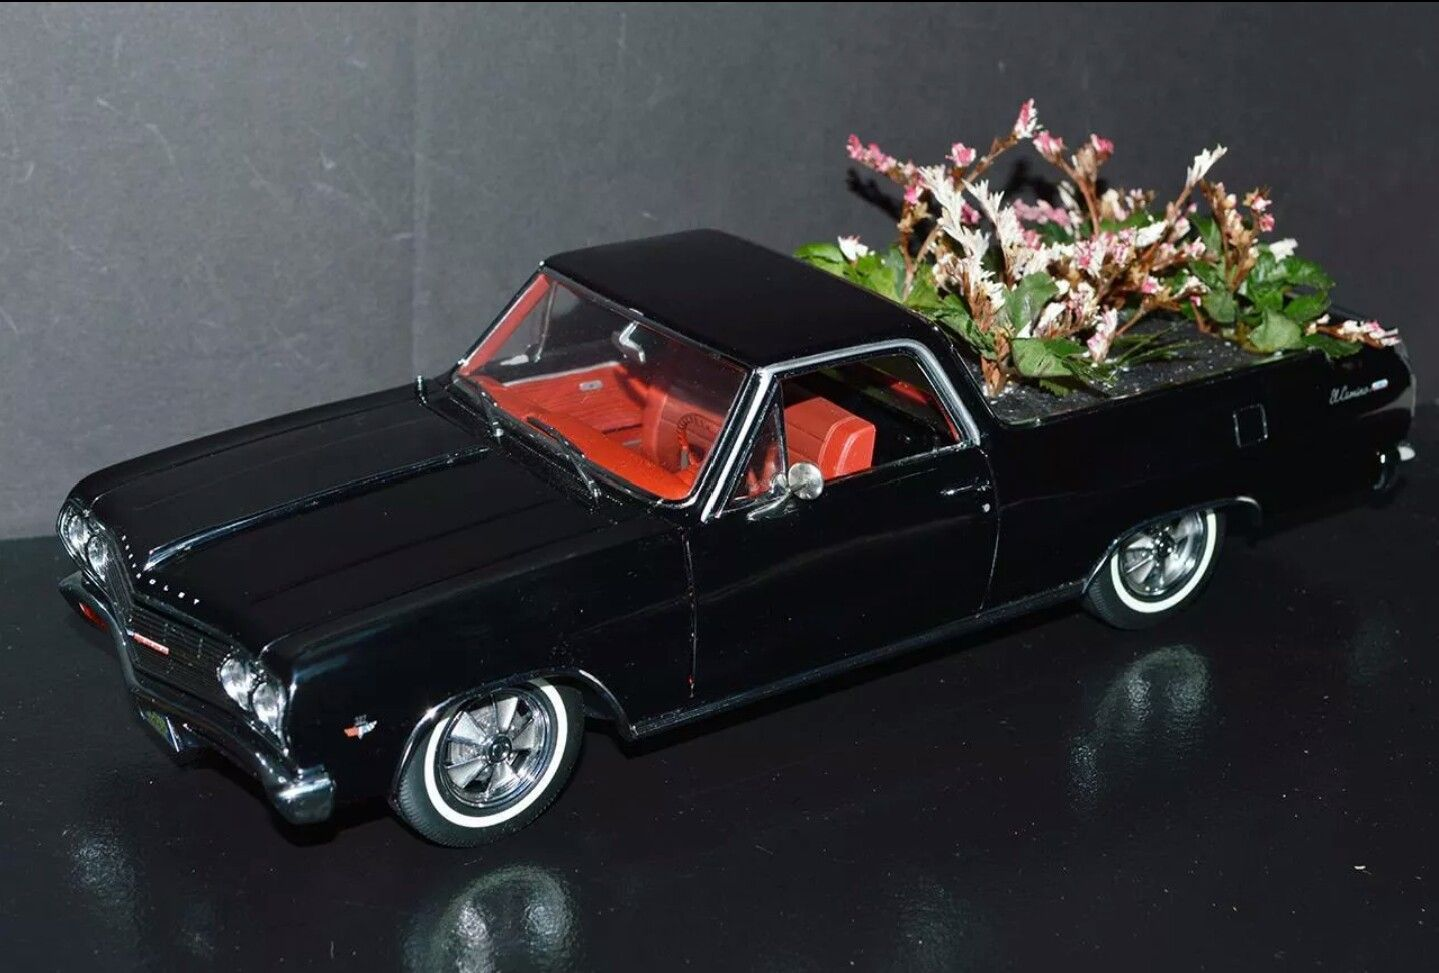 El camino funeral flower car model cars pinterest funeral el camino funeral flower car izmirmasajfo